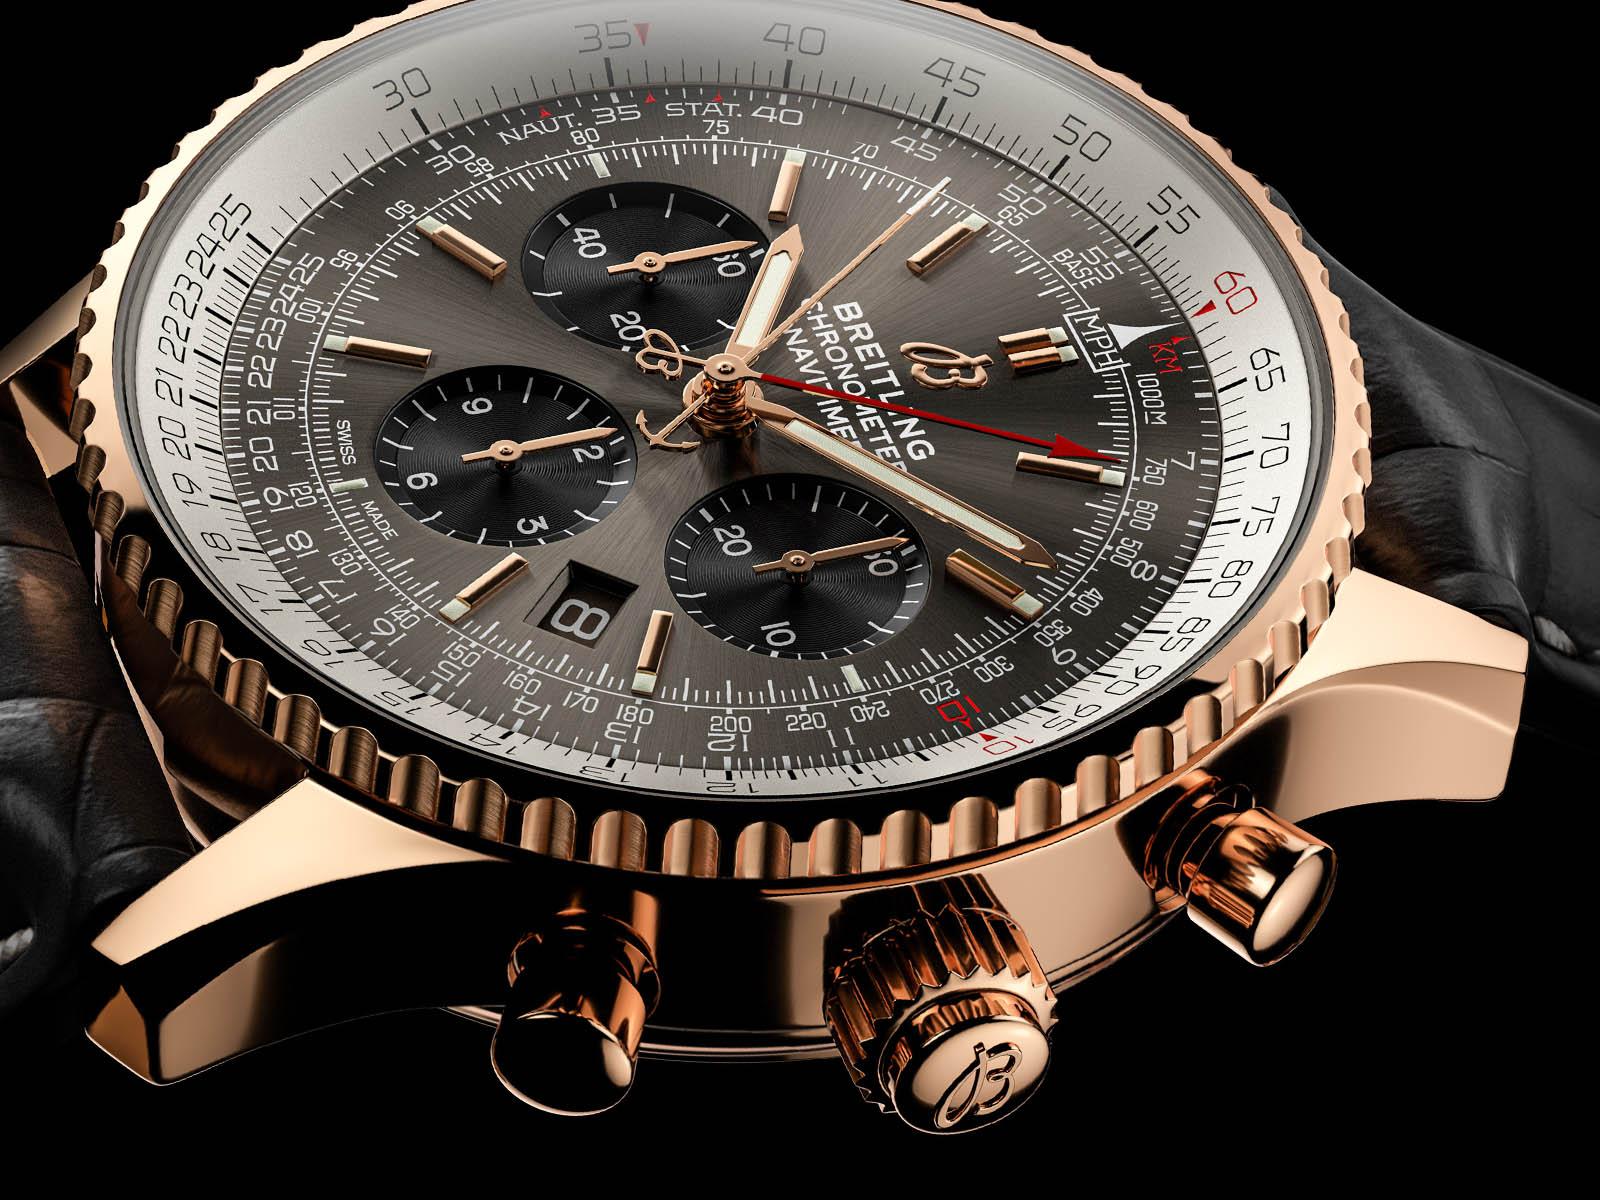 rb0311e61f1p1-breitling-navitimer-b03-chronograph-rattrapante-4.jpg